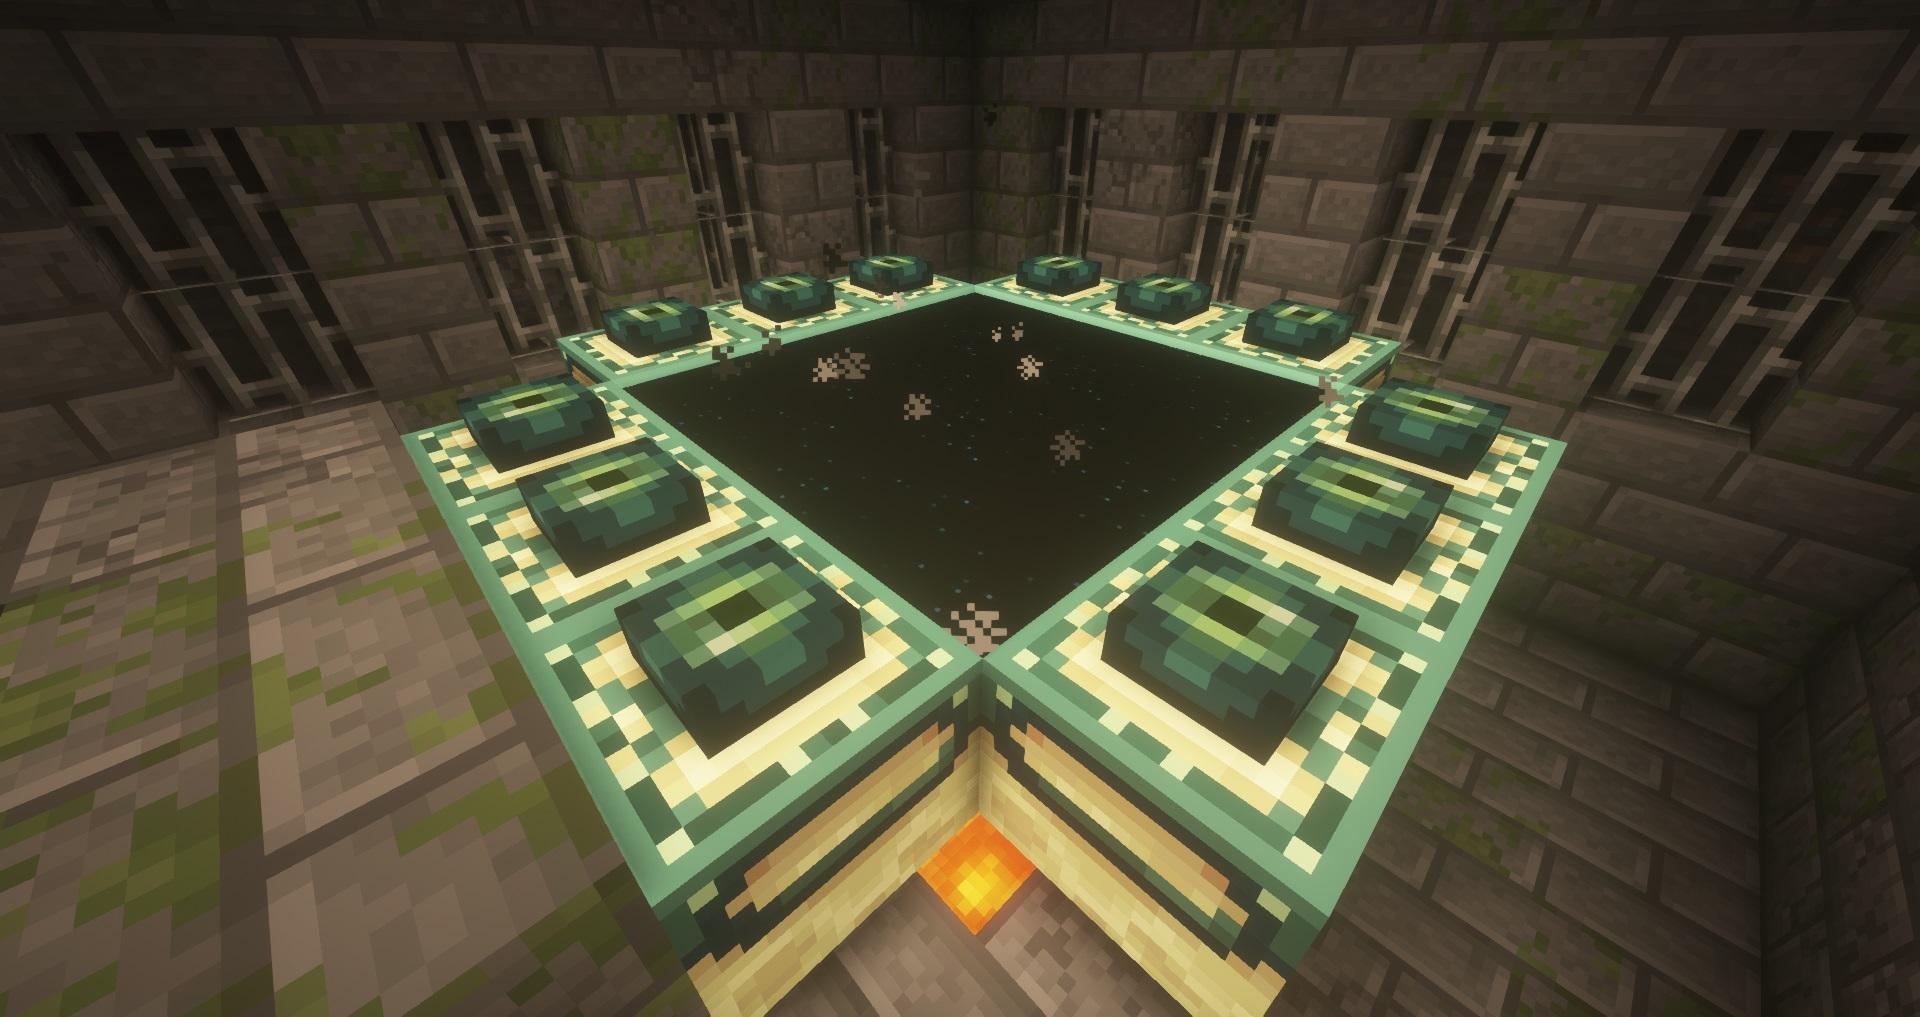 Minecraft seed - 12-eye active end portal - A completed and activated End Portal in a Minecraft stronghold